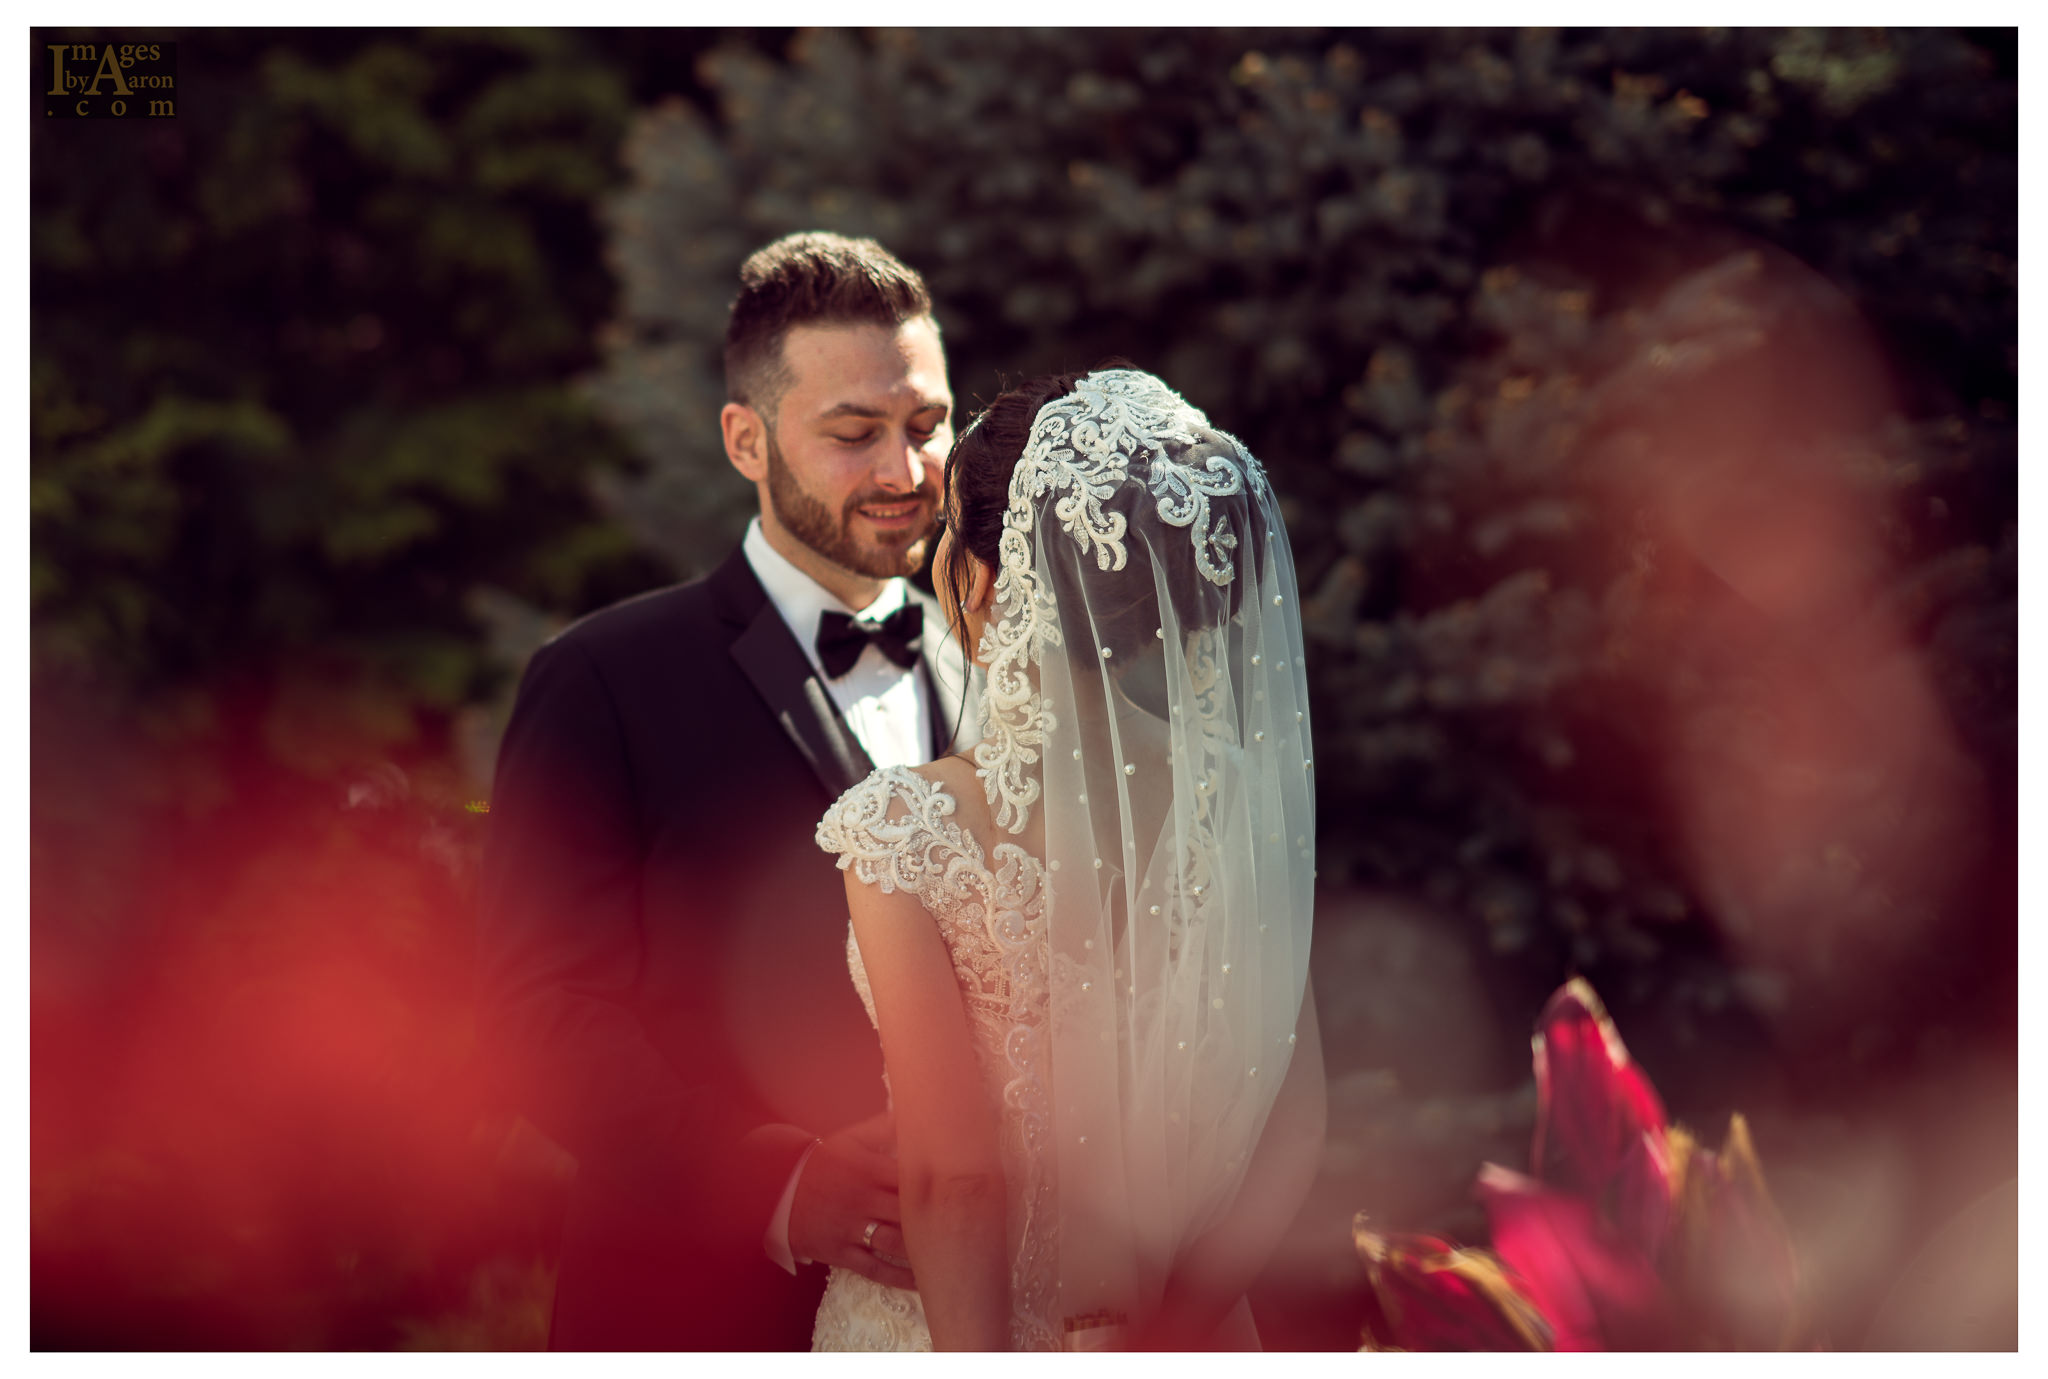 Gokce Turkish Wedding First Look New York Photographer Wedding Photography The Royal Manor-7.jpg